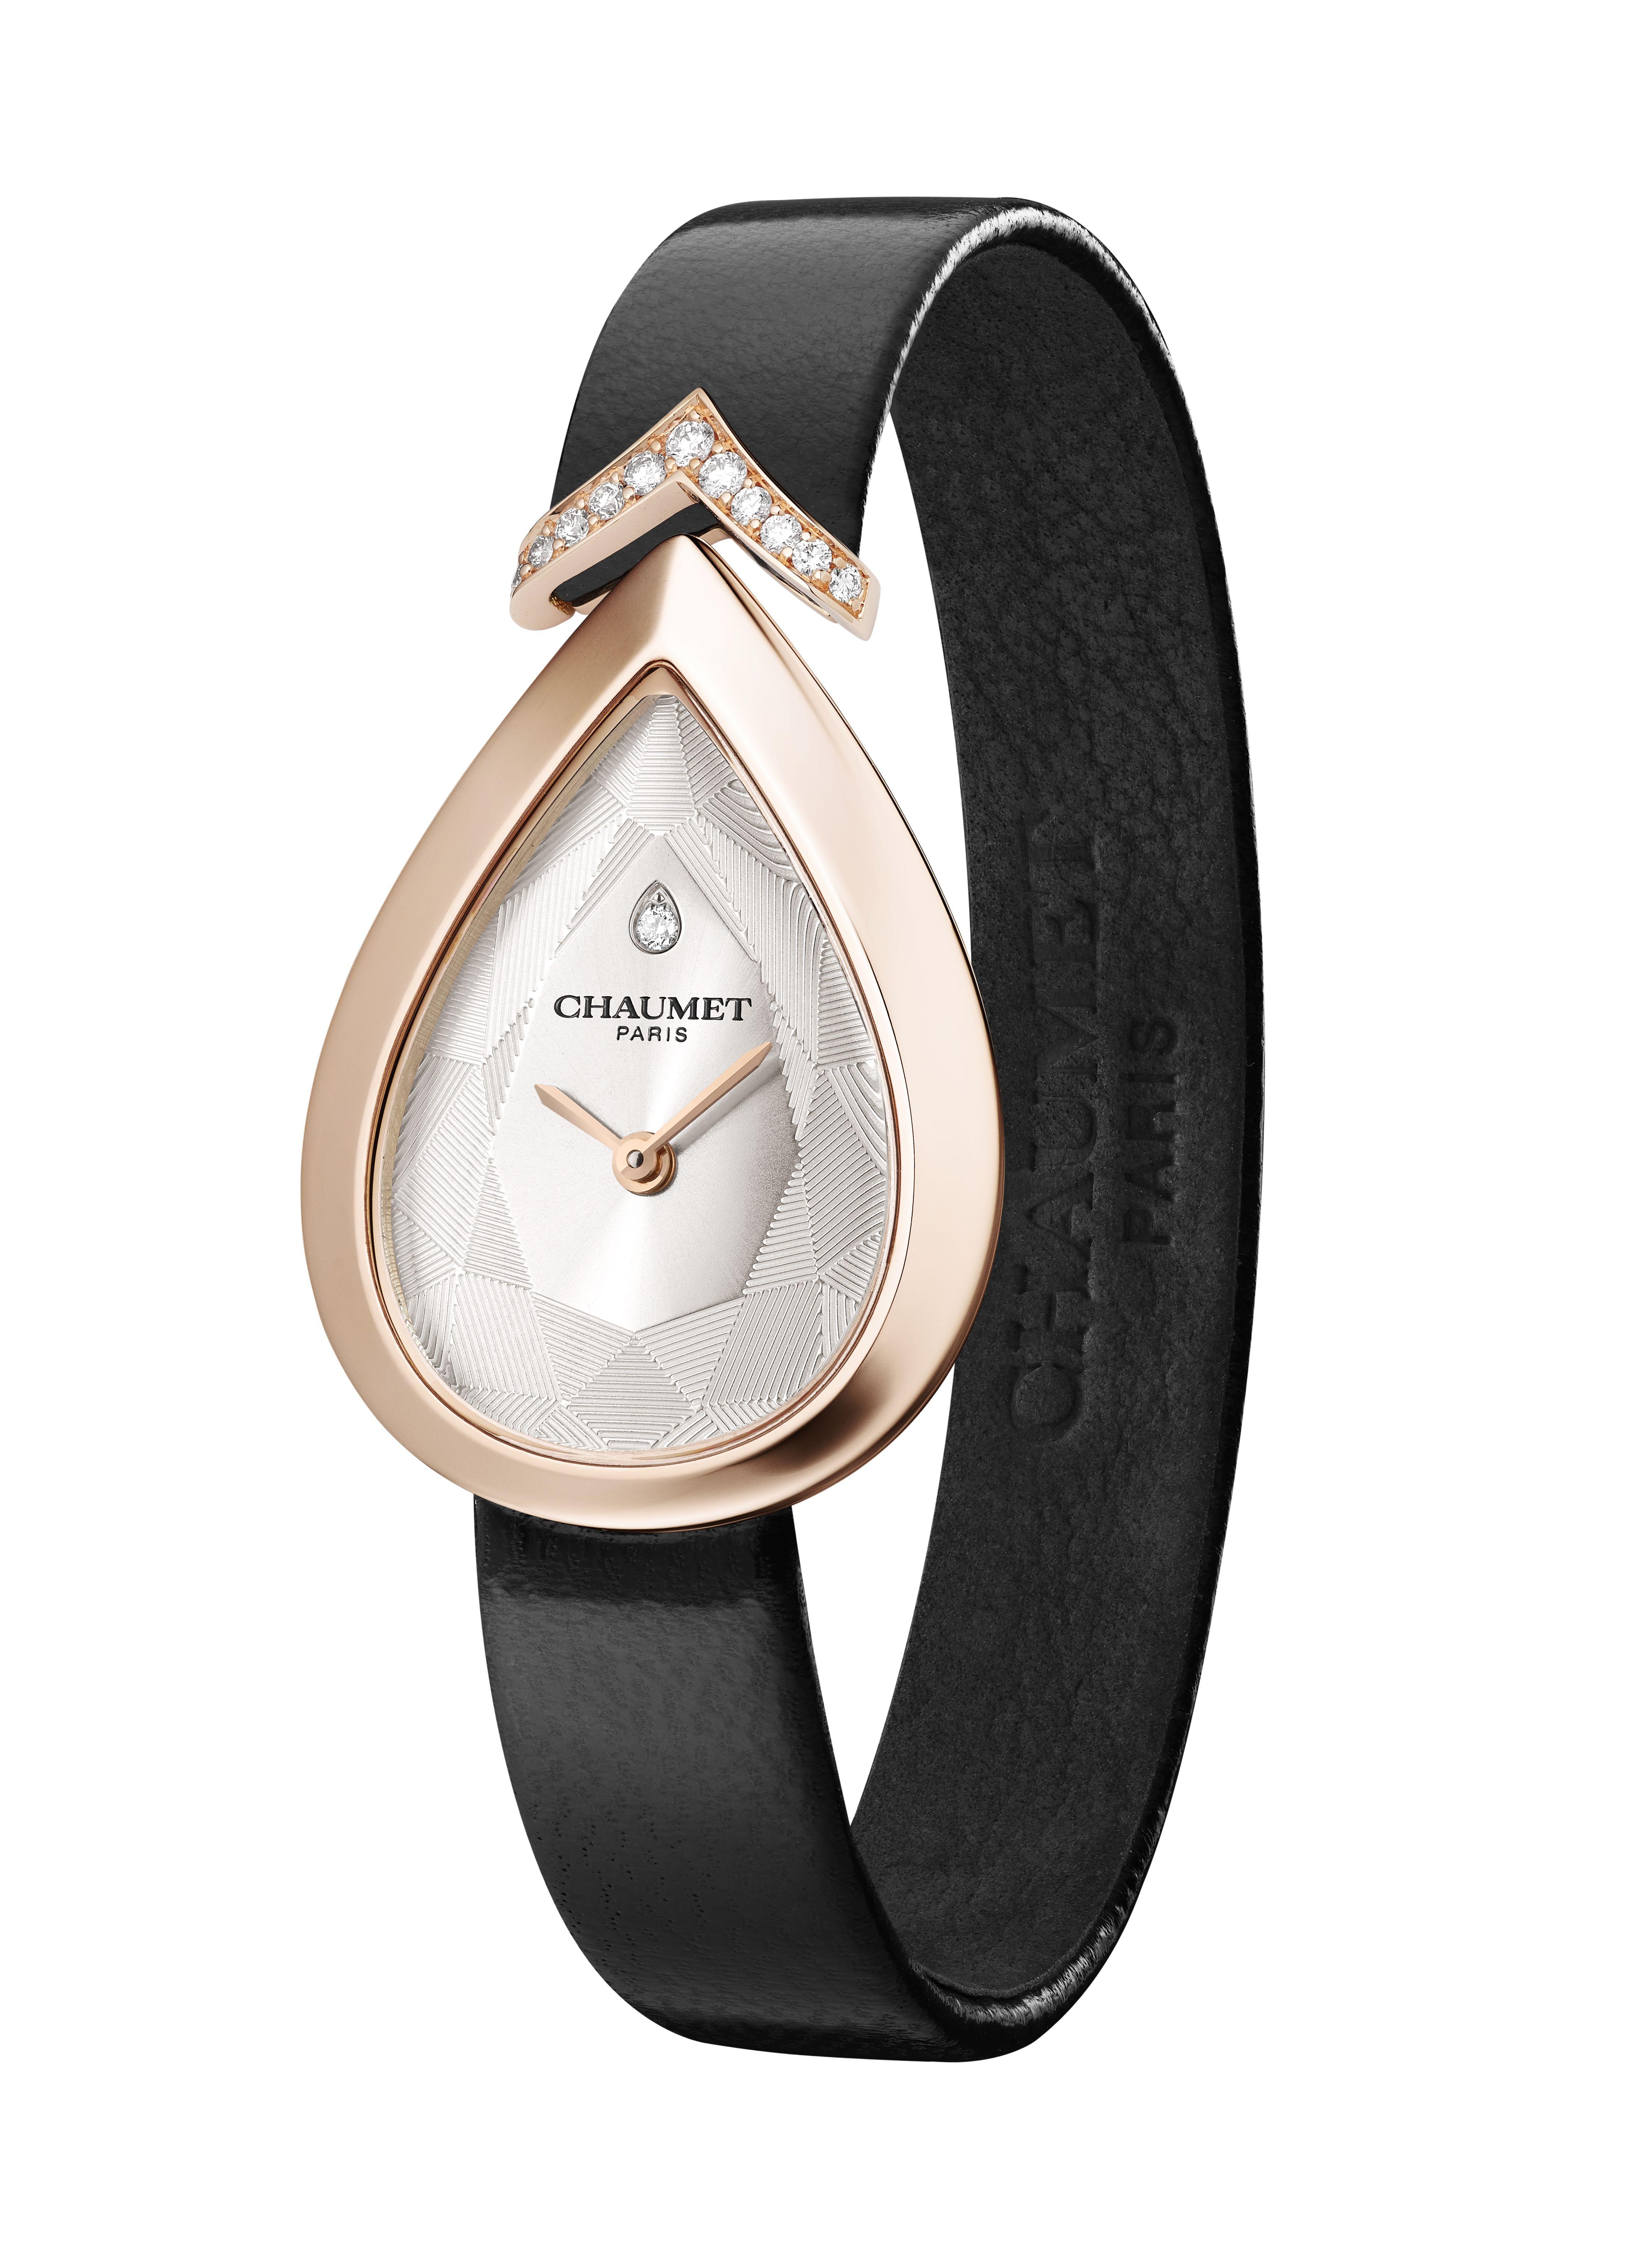 Chaumet's Josephine watch